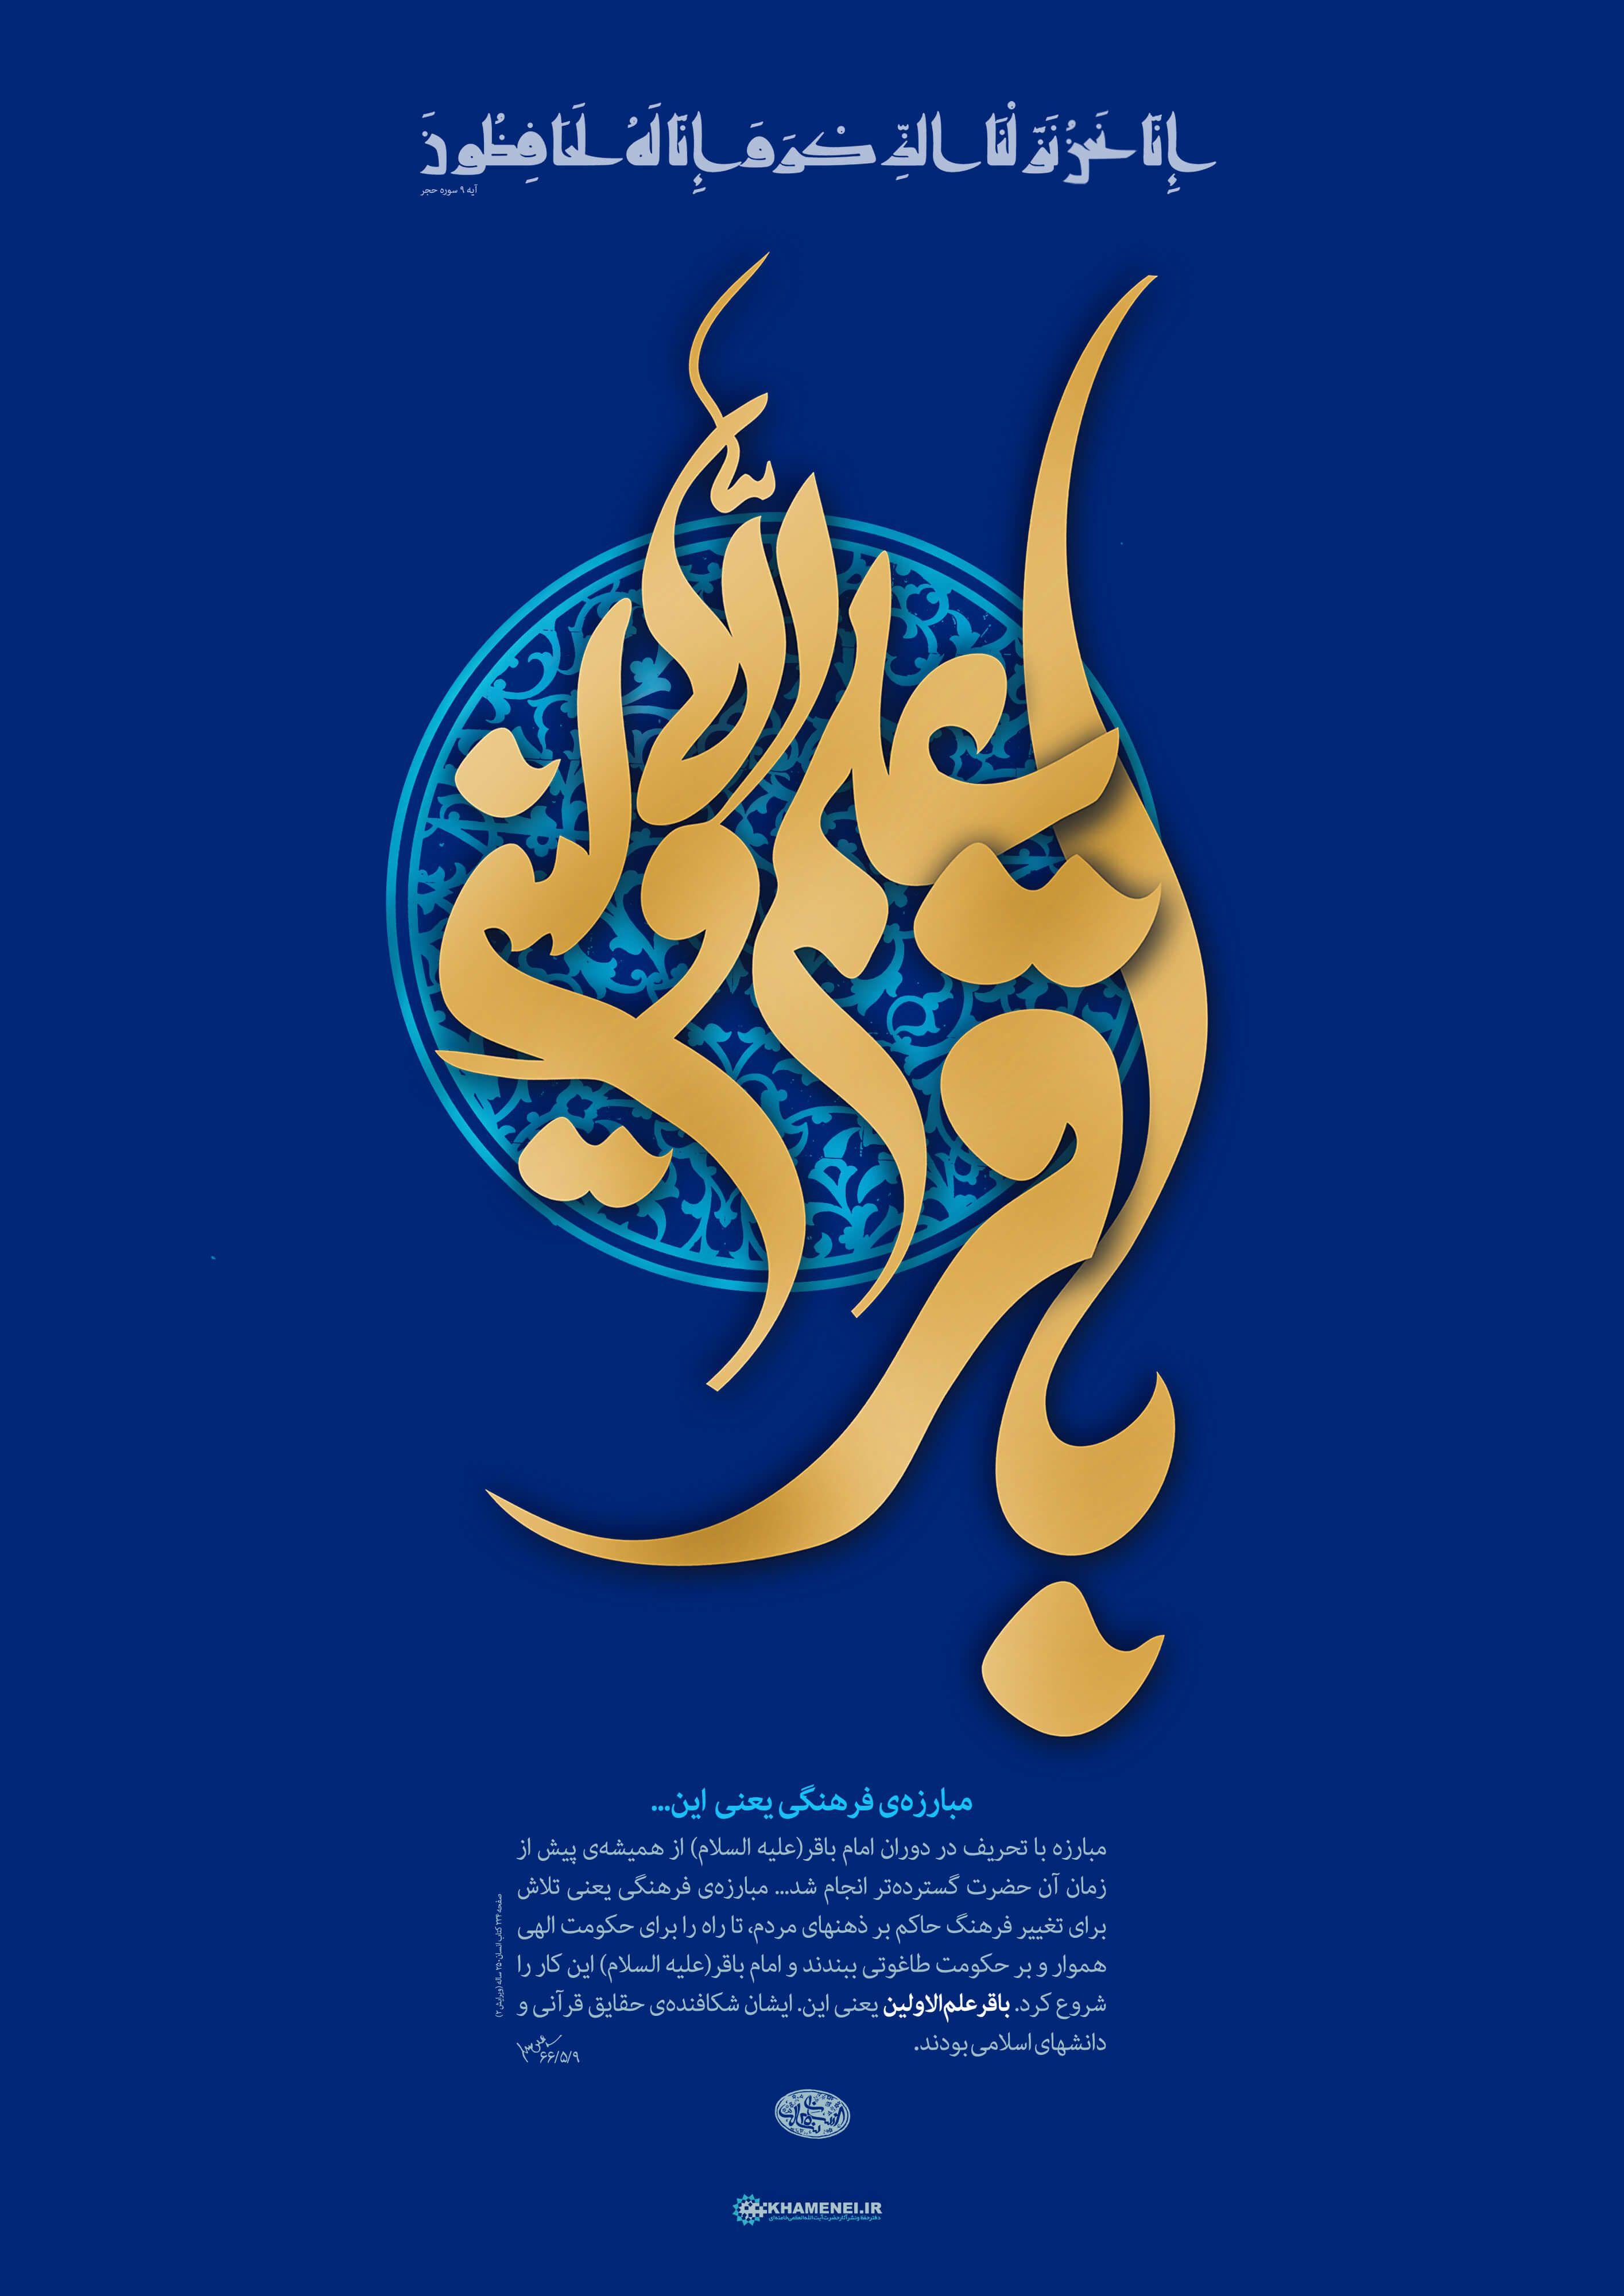 امام باقر علیه السلام و مبارزه ی فرهنگ Islamic Art Islamic Wallpaper Art Movement